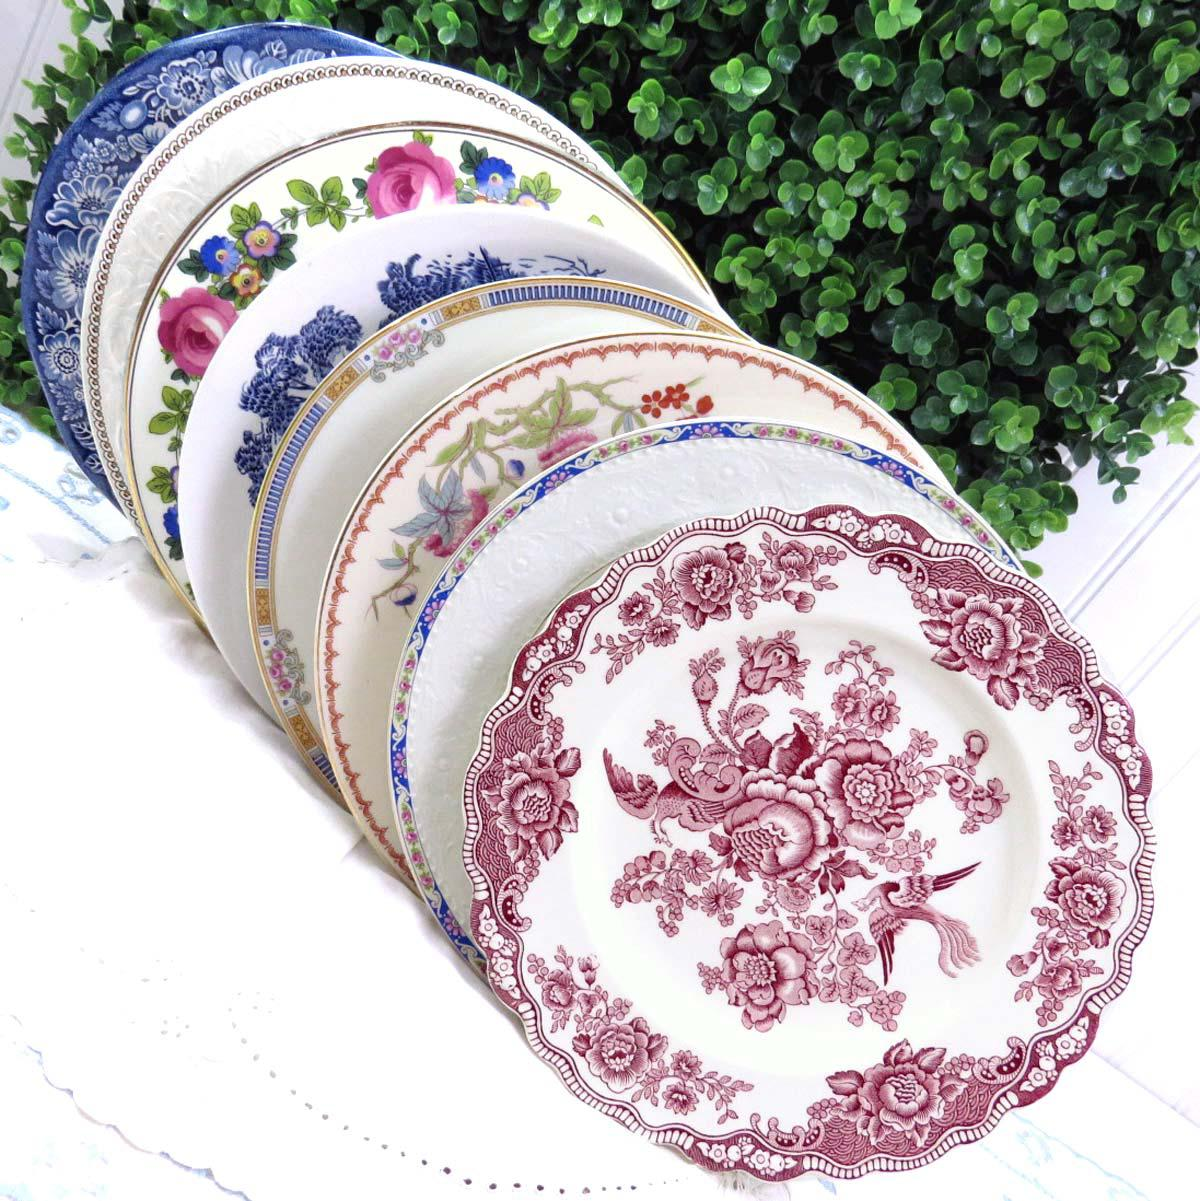 Vintage Mismatched Fine China Dinner Plates - Set of 8 - Image 11 of 12  sc 1 st  Chairish & Vintage Mismatched Fine China Dinner Plates - Set of 8 | Chairish